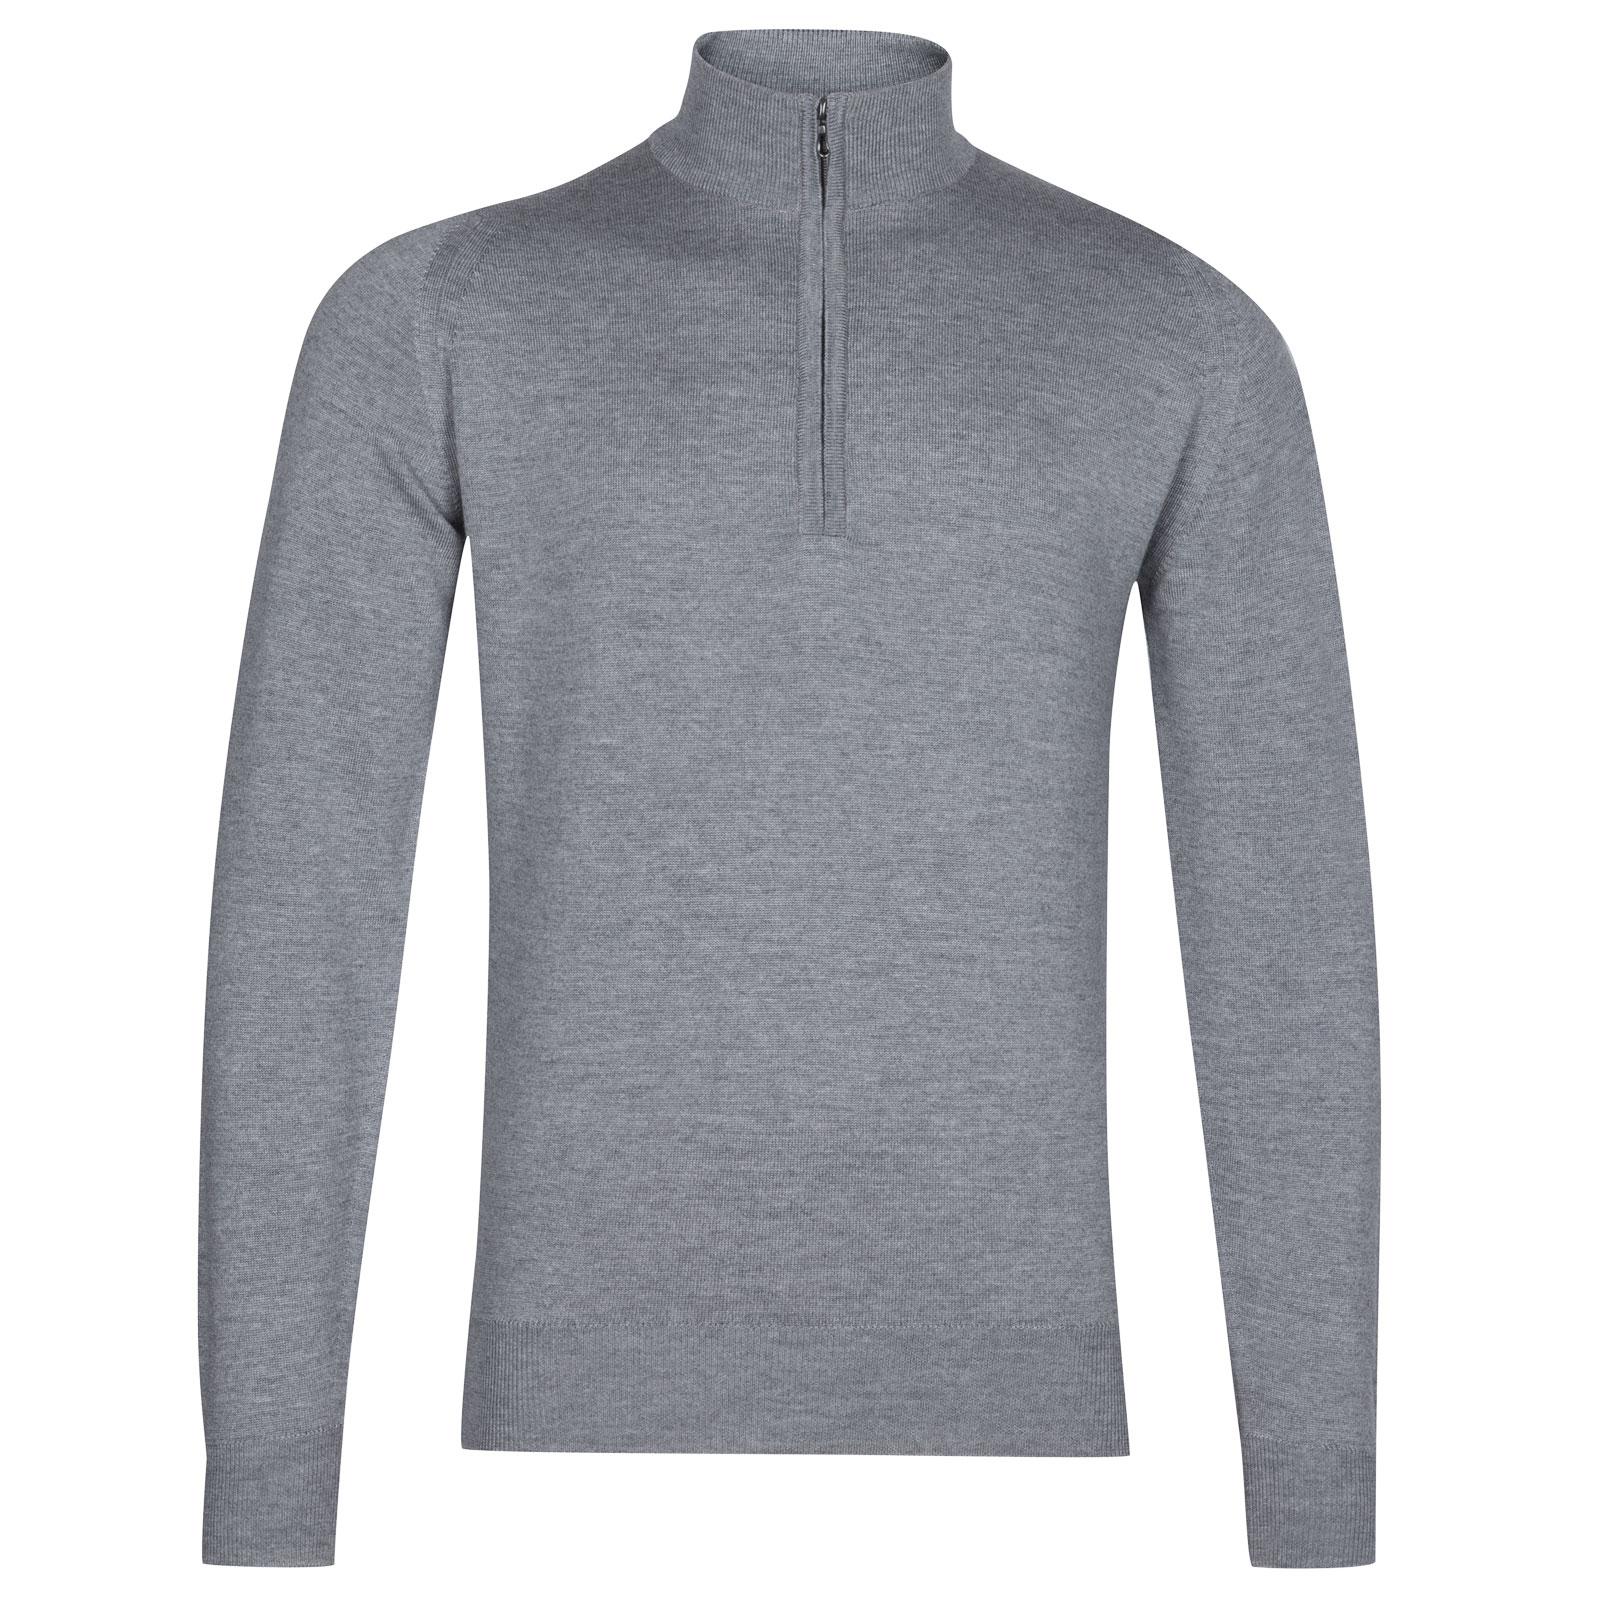 John Smedley tapton Merino Wool Pullover in Silver-L